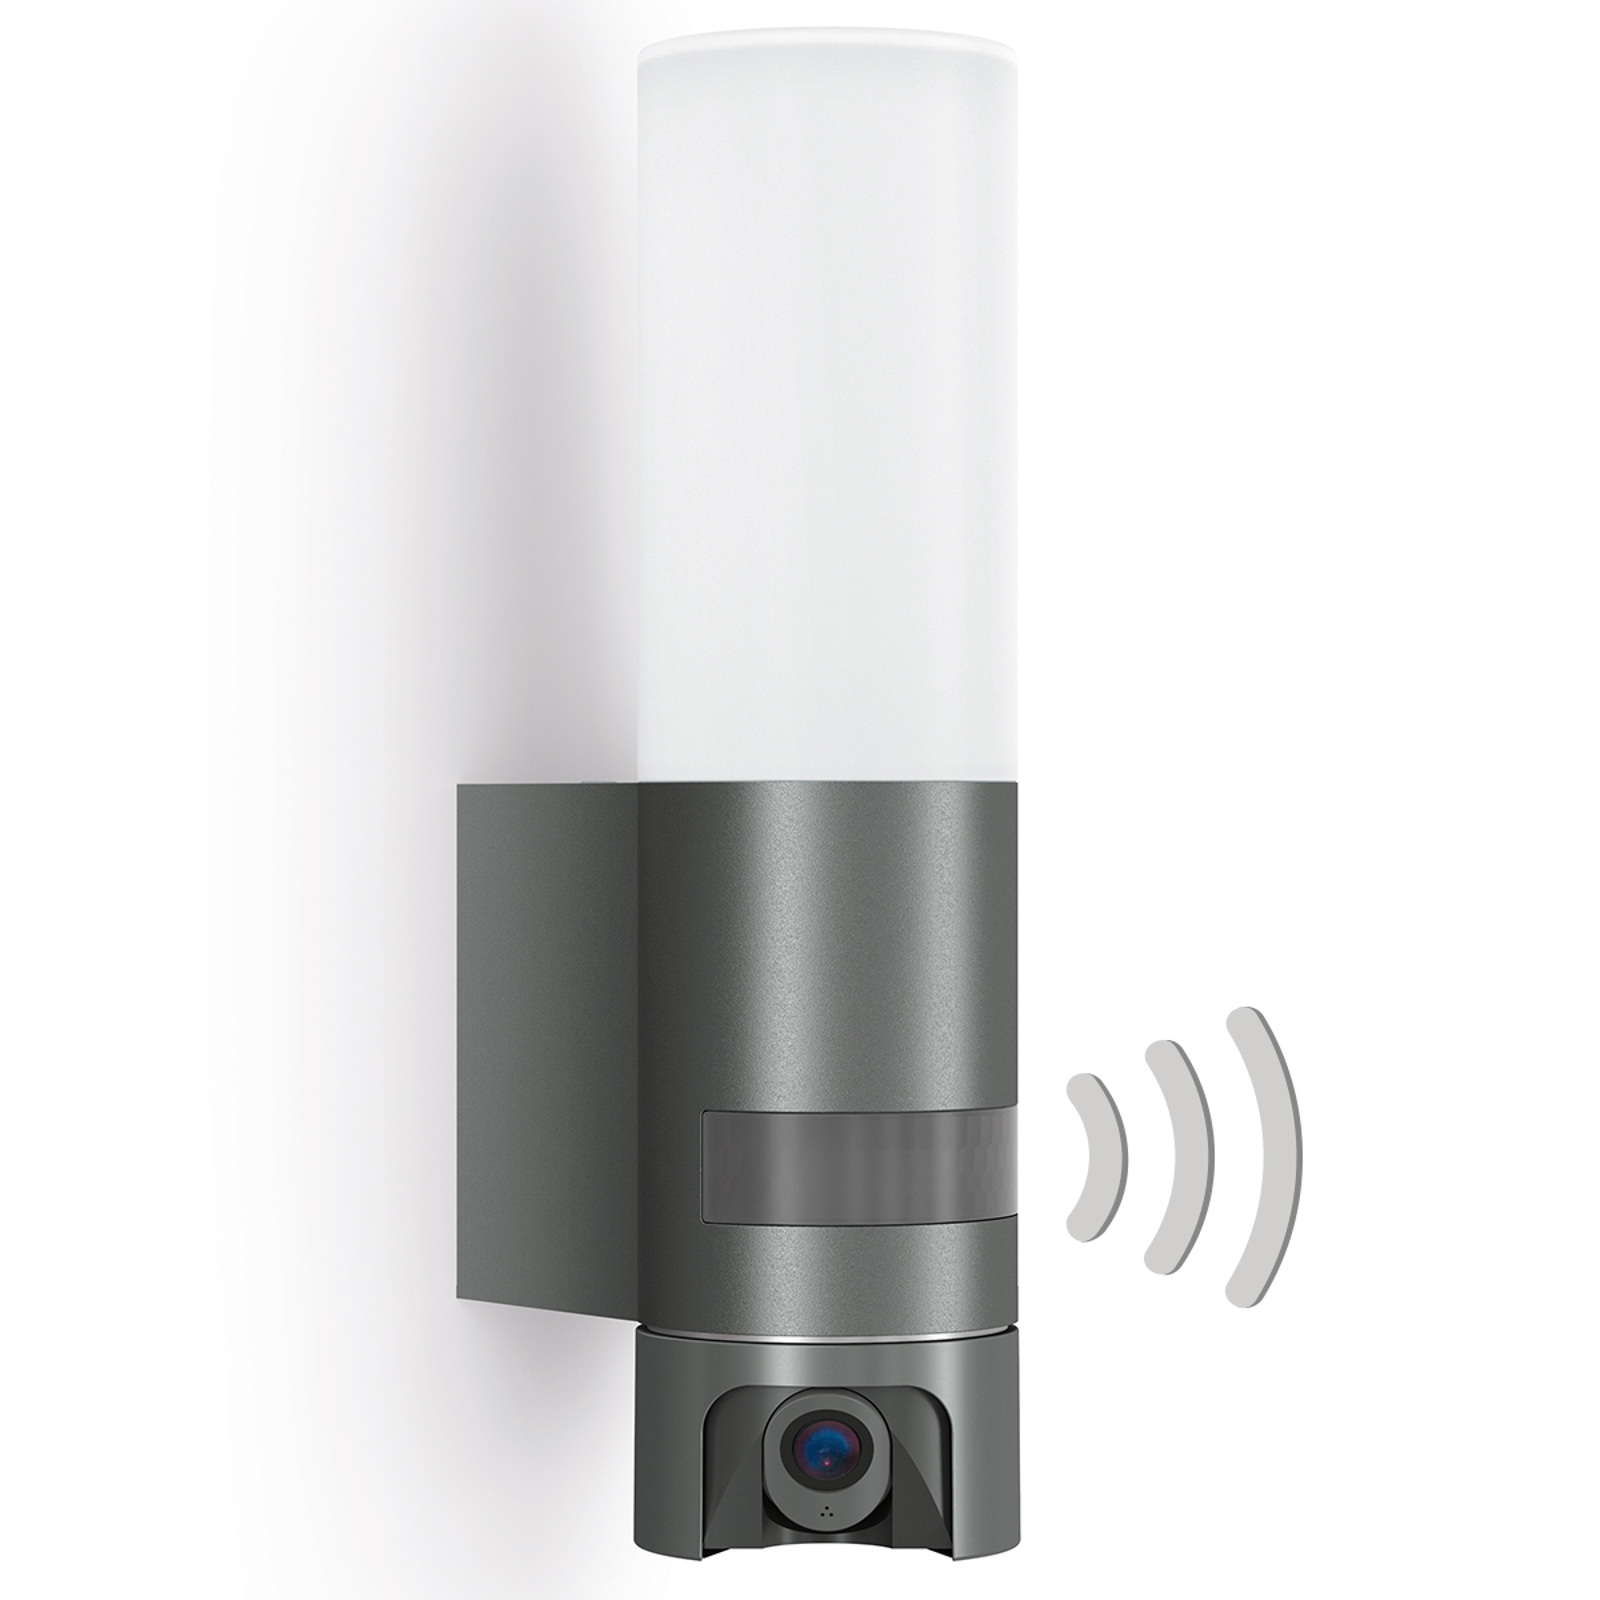 Sensor-LED-Außenwandleuchte L 620 Cam, anthrazit